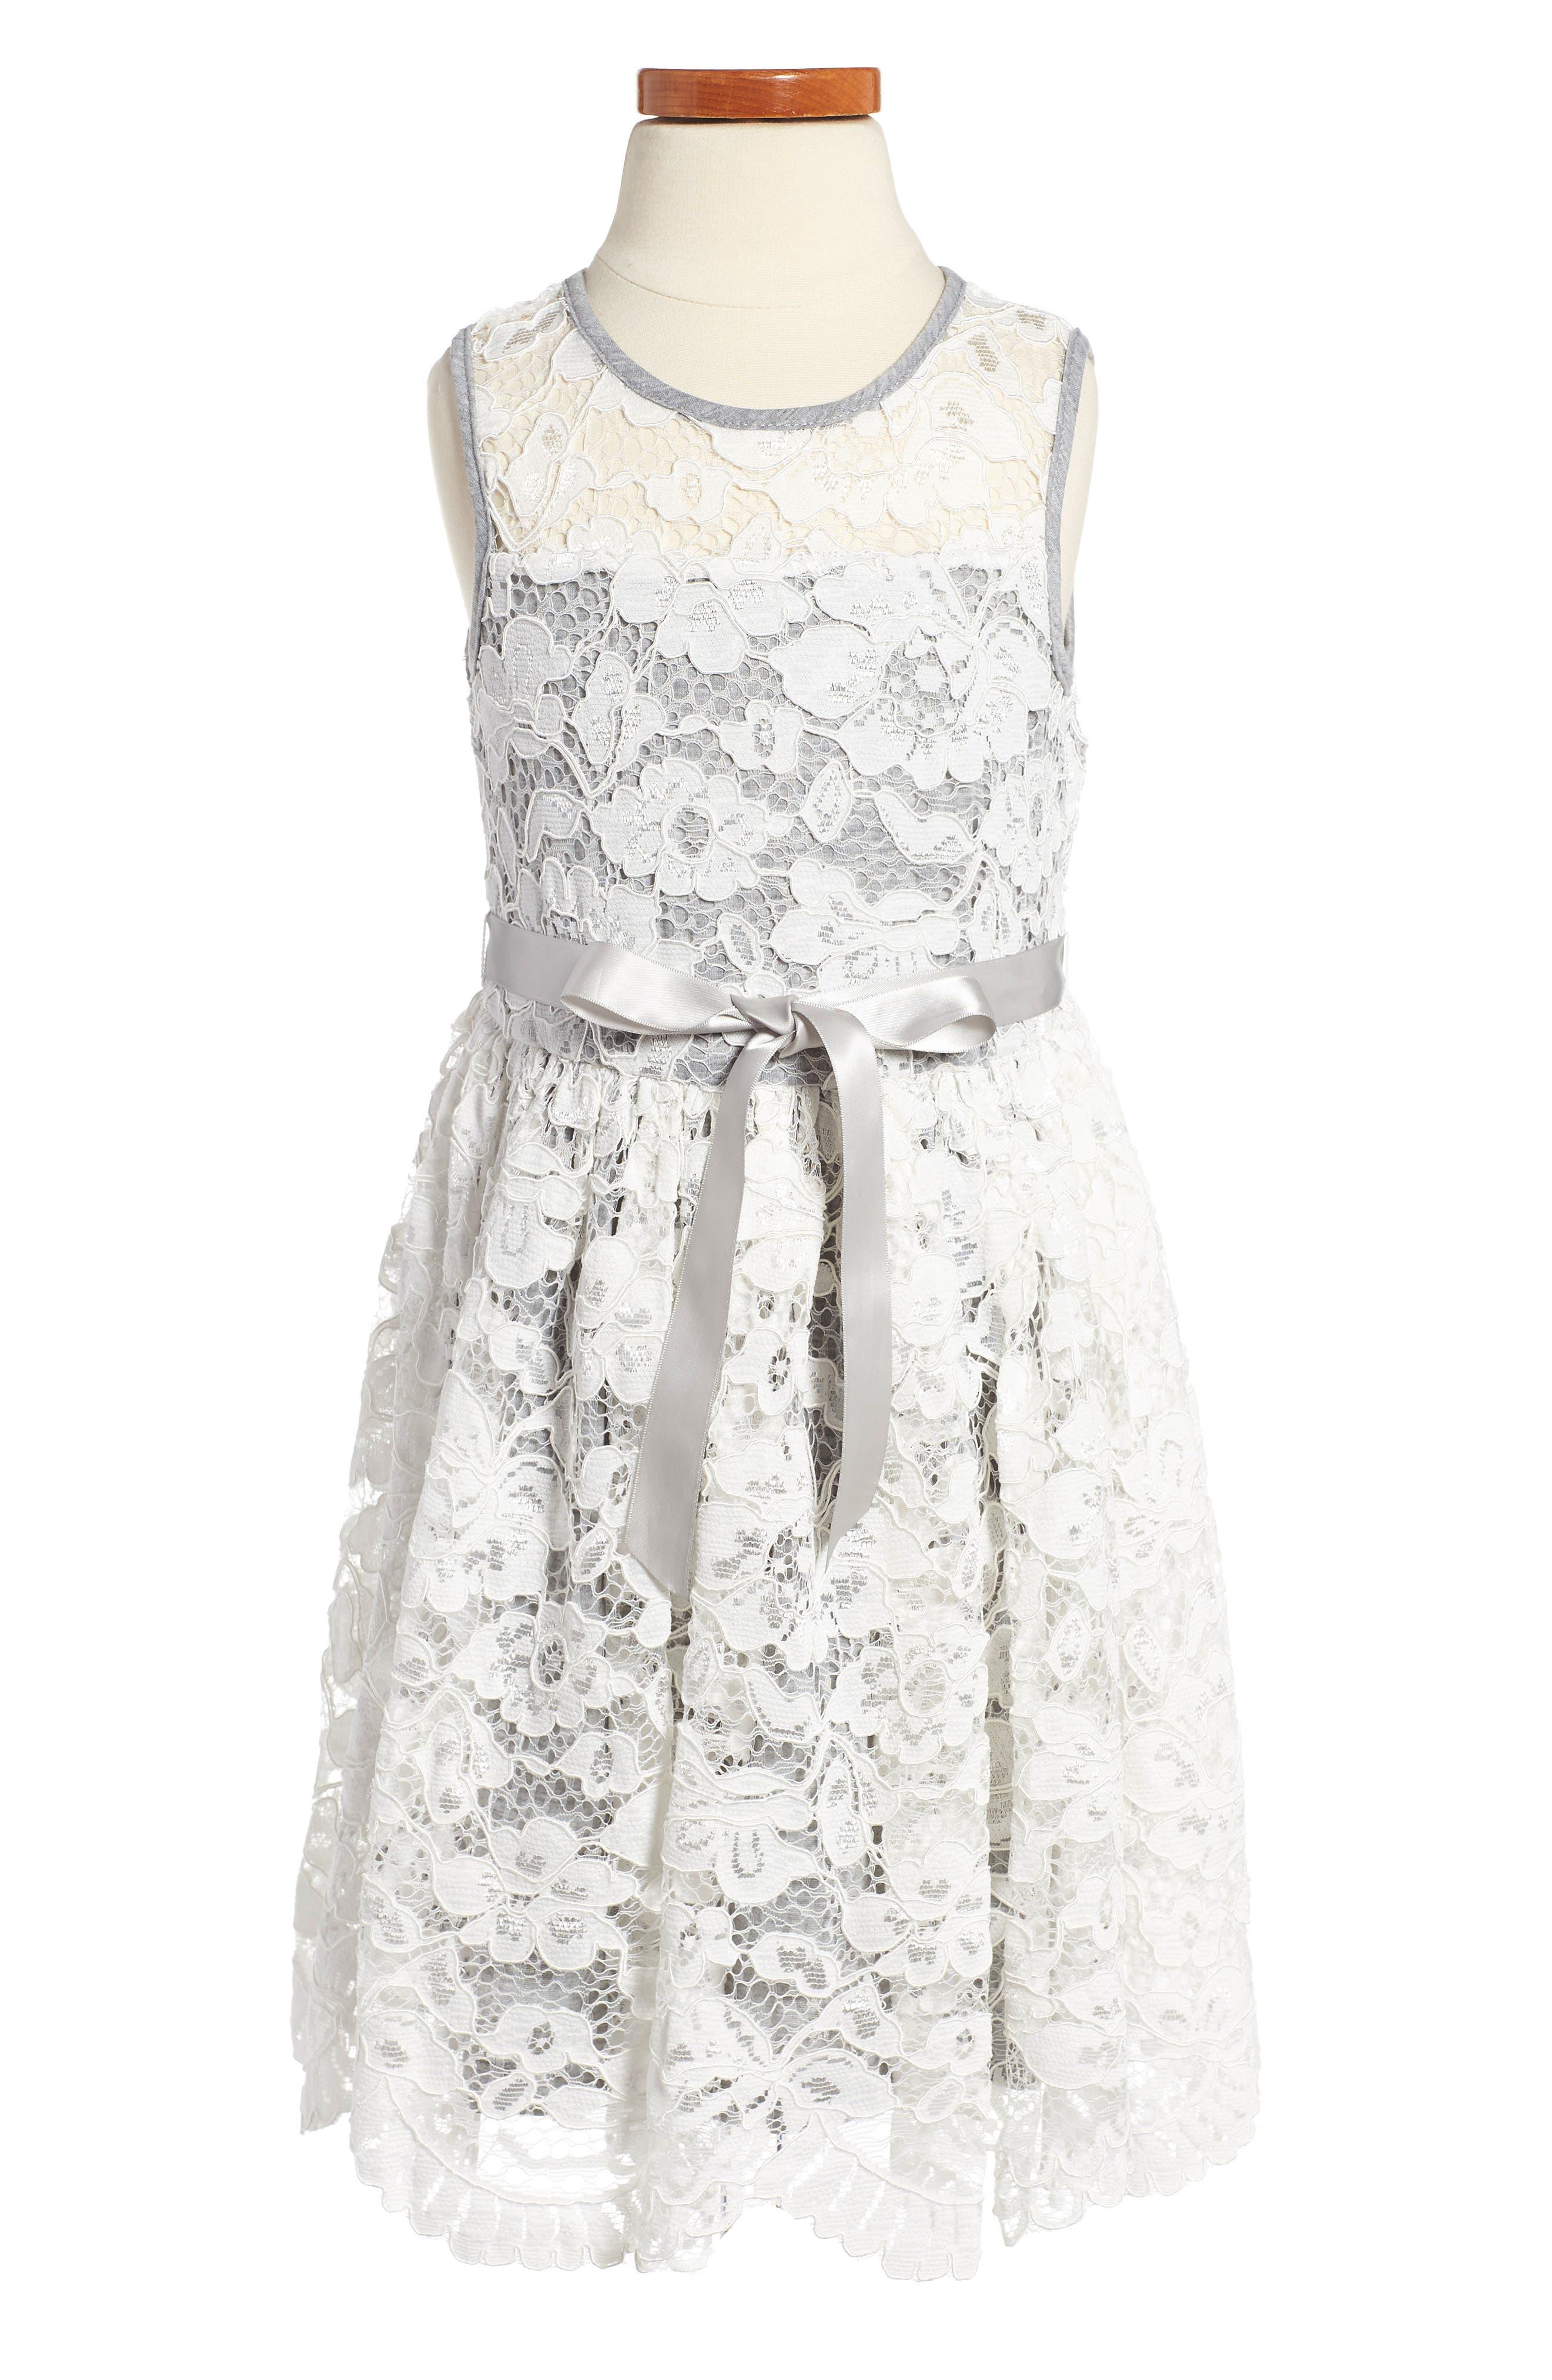 Scalloped Floral Lace Dress,                             Alternate thumbnail 3, color,                             904